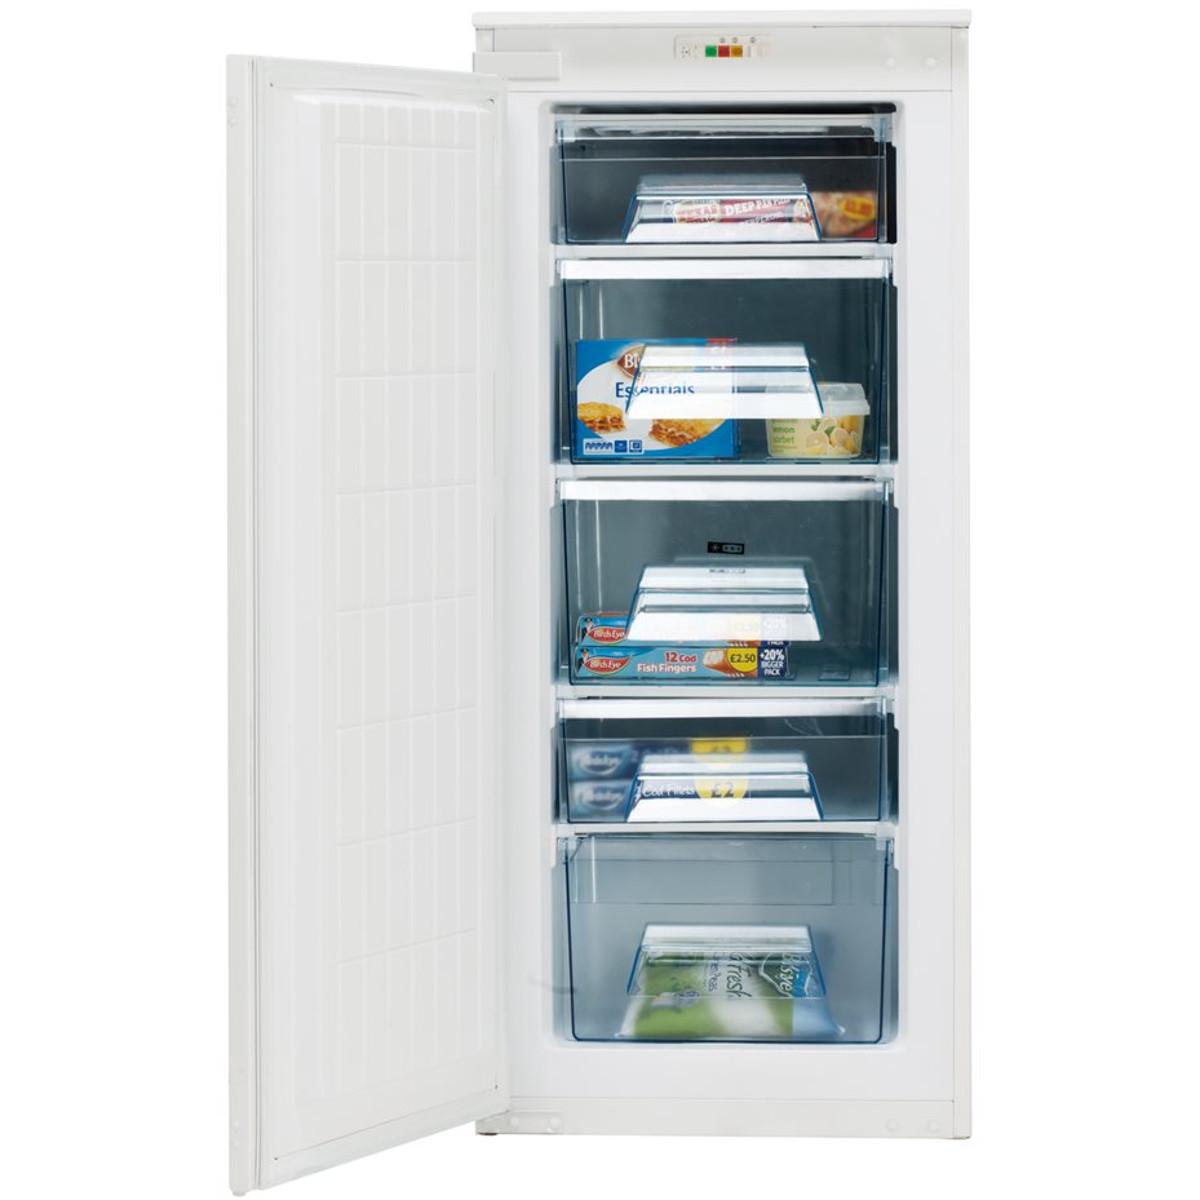 Caple RIF123 Integrated In-Column Freezer | Discount Appliance Centre